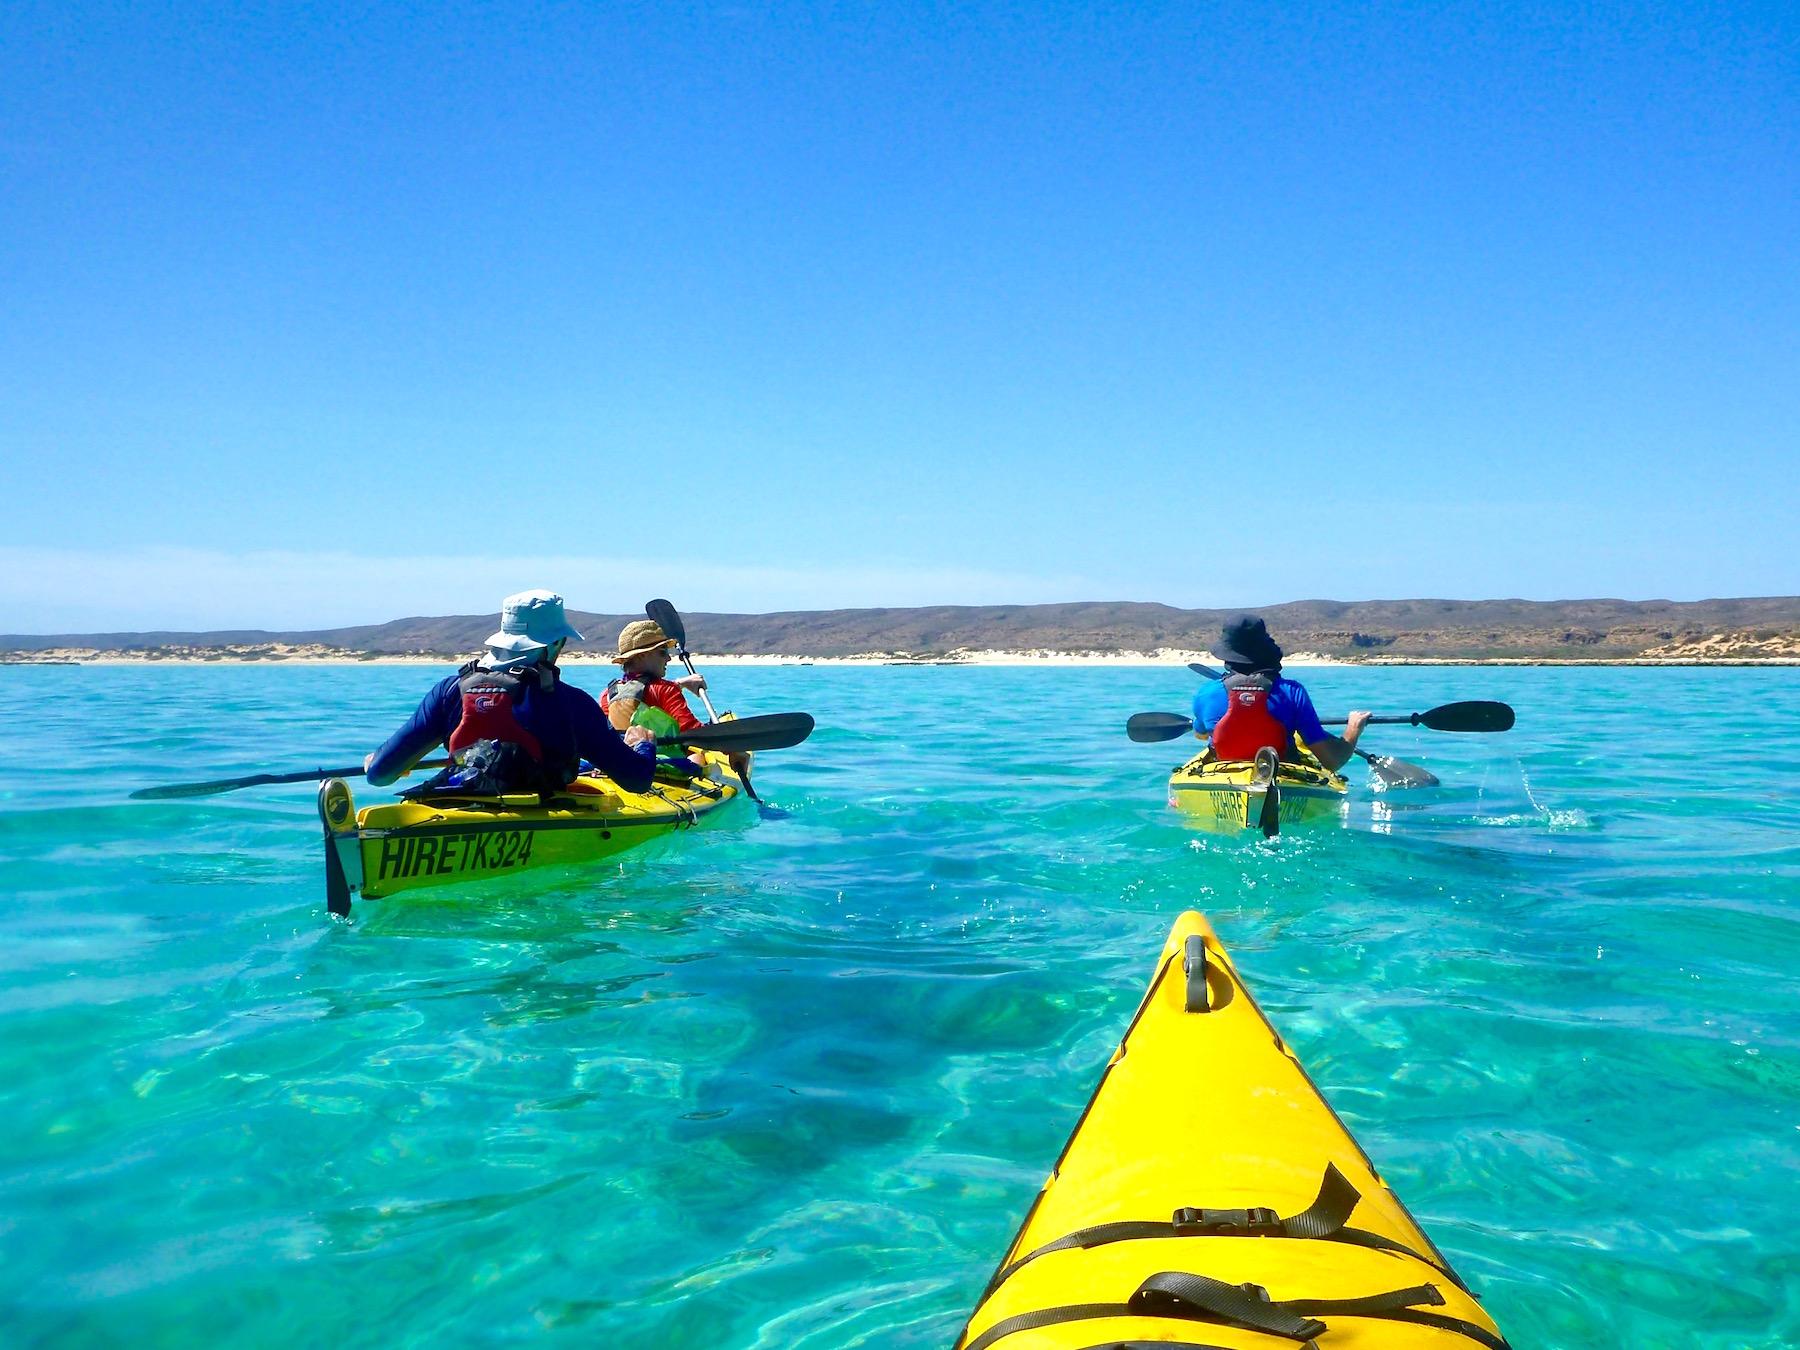 Sea Kayak Ningaloo, sea kayak, kayak, snorkel, eco tour, guided tour, Ningaloo Reef, Exmouth, Western Australia, Exmouth Adventure Co, Cape Range National Park, Coral Coast